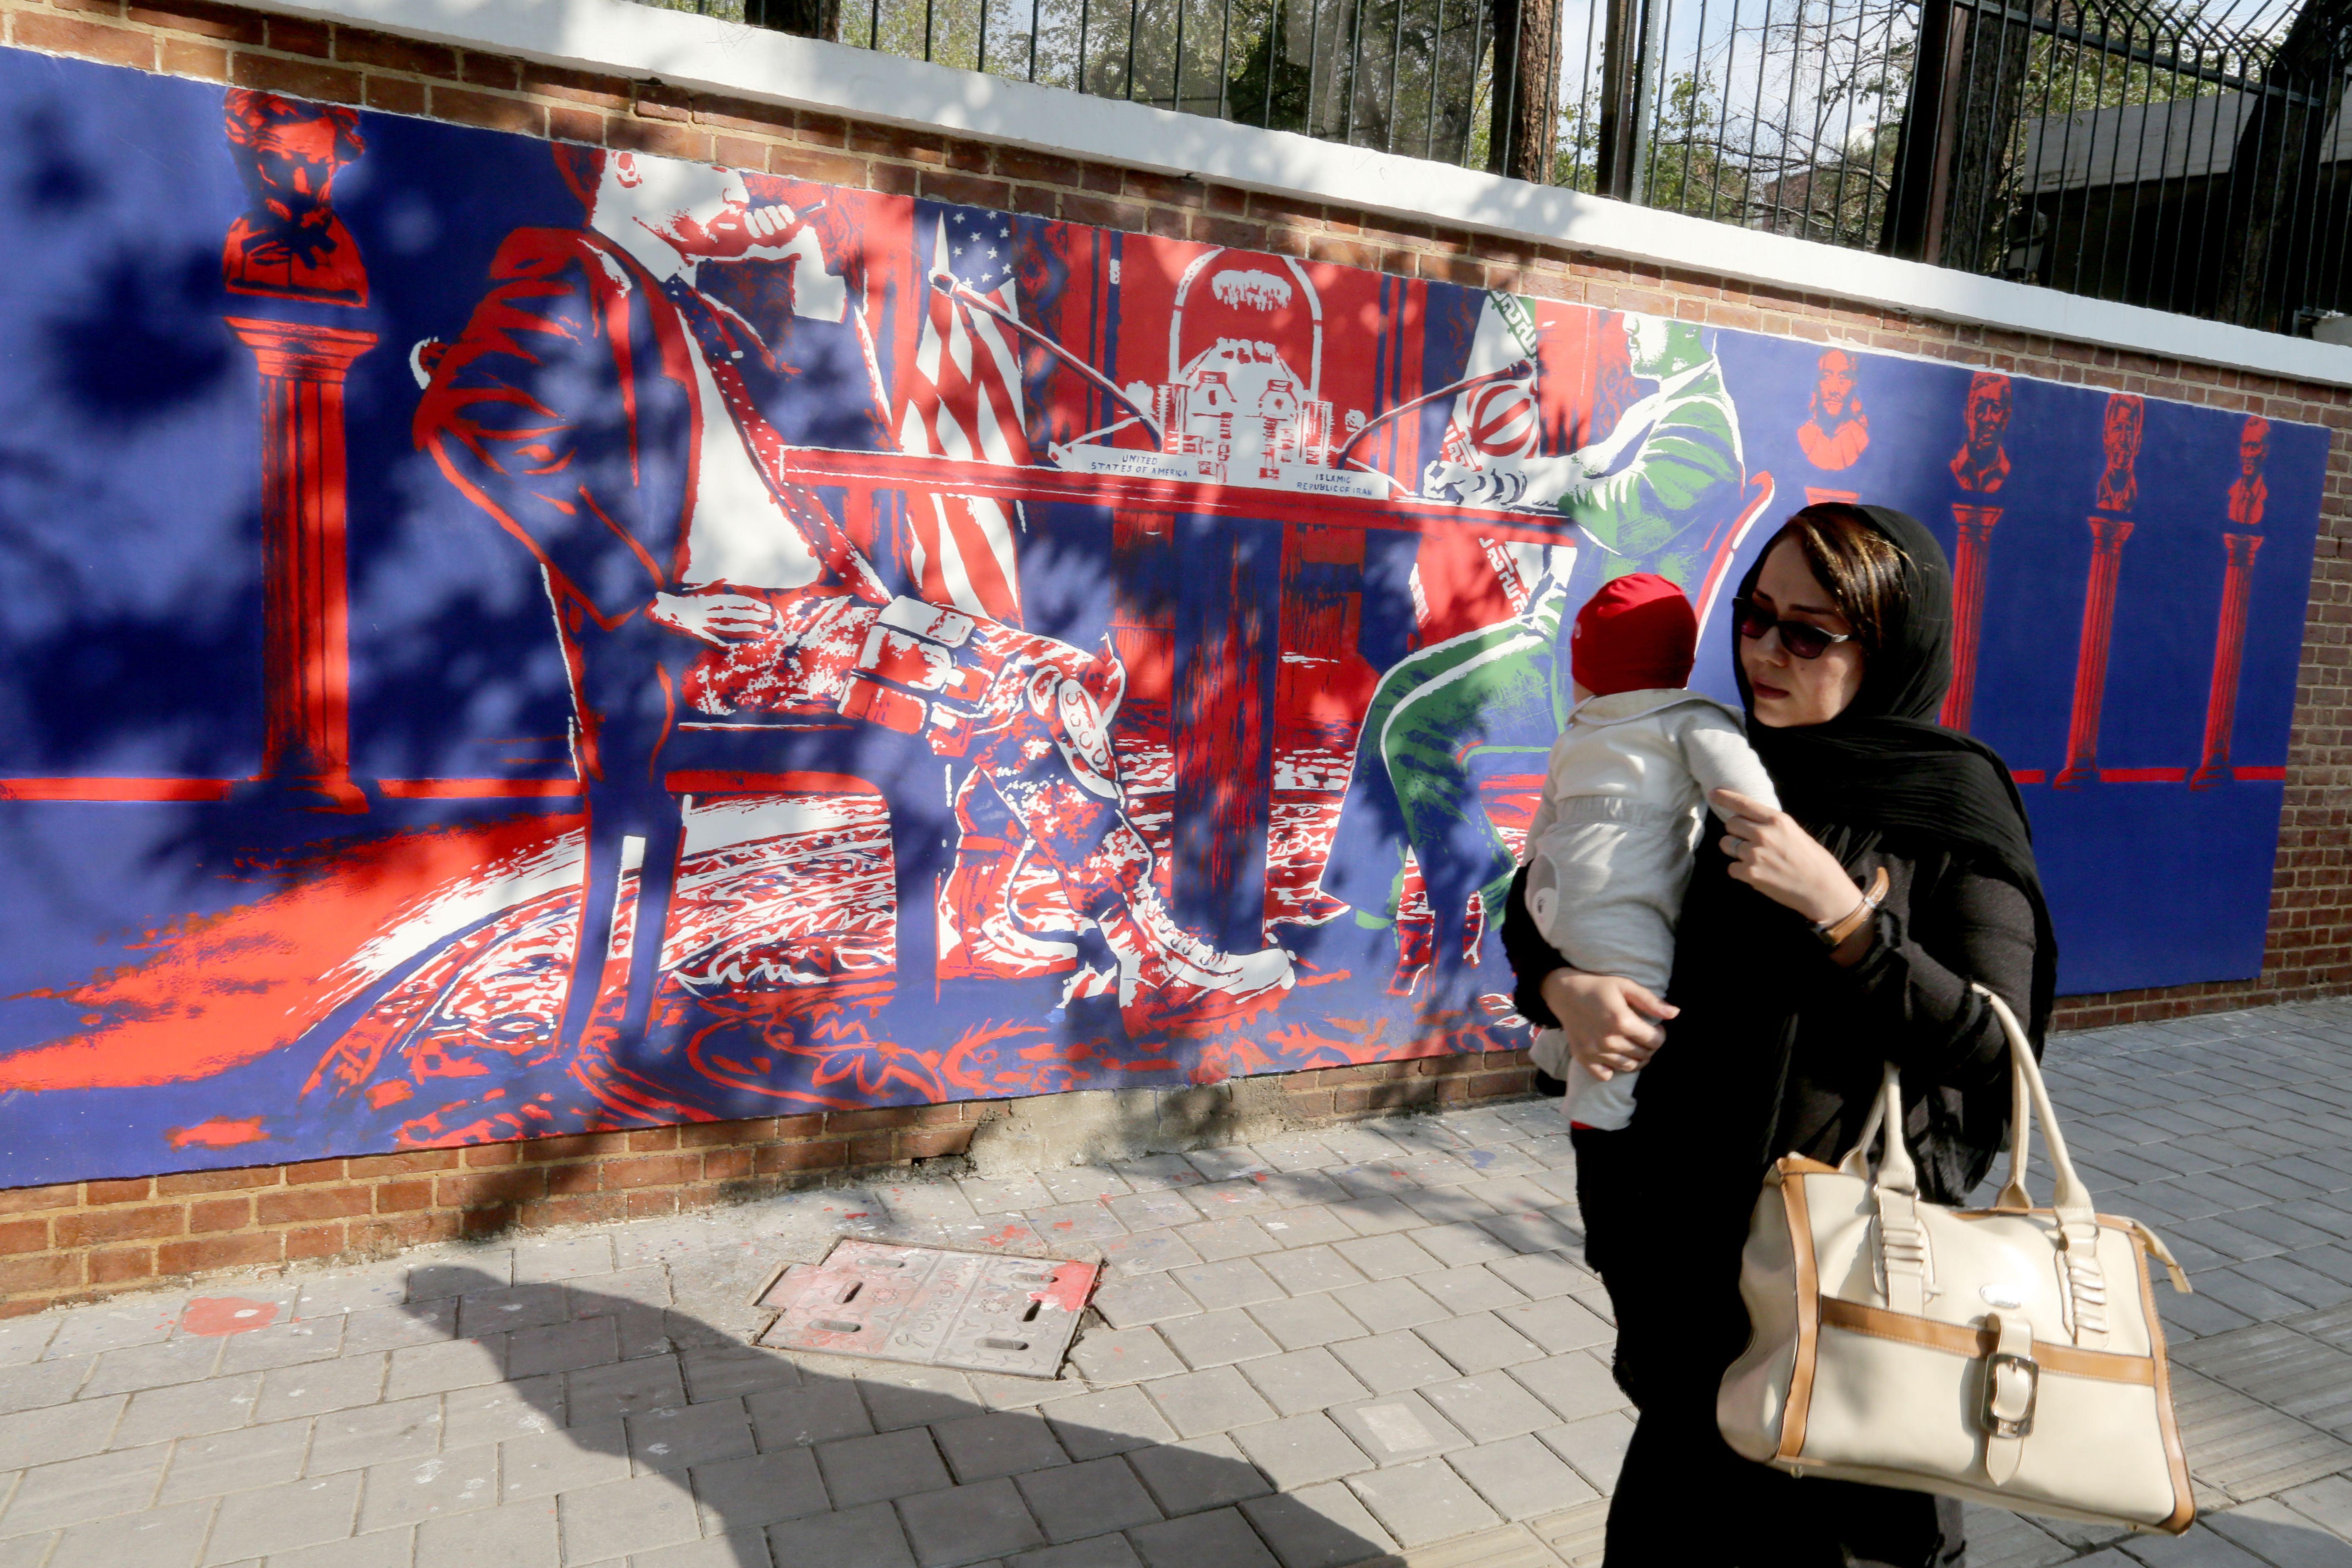 A new mural in Tehran on Nov. 2.